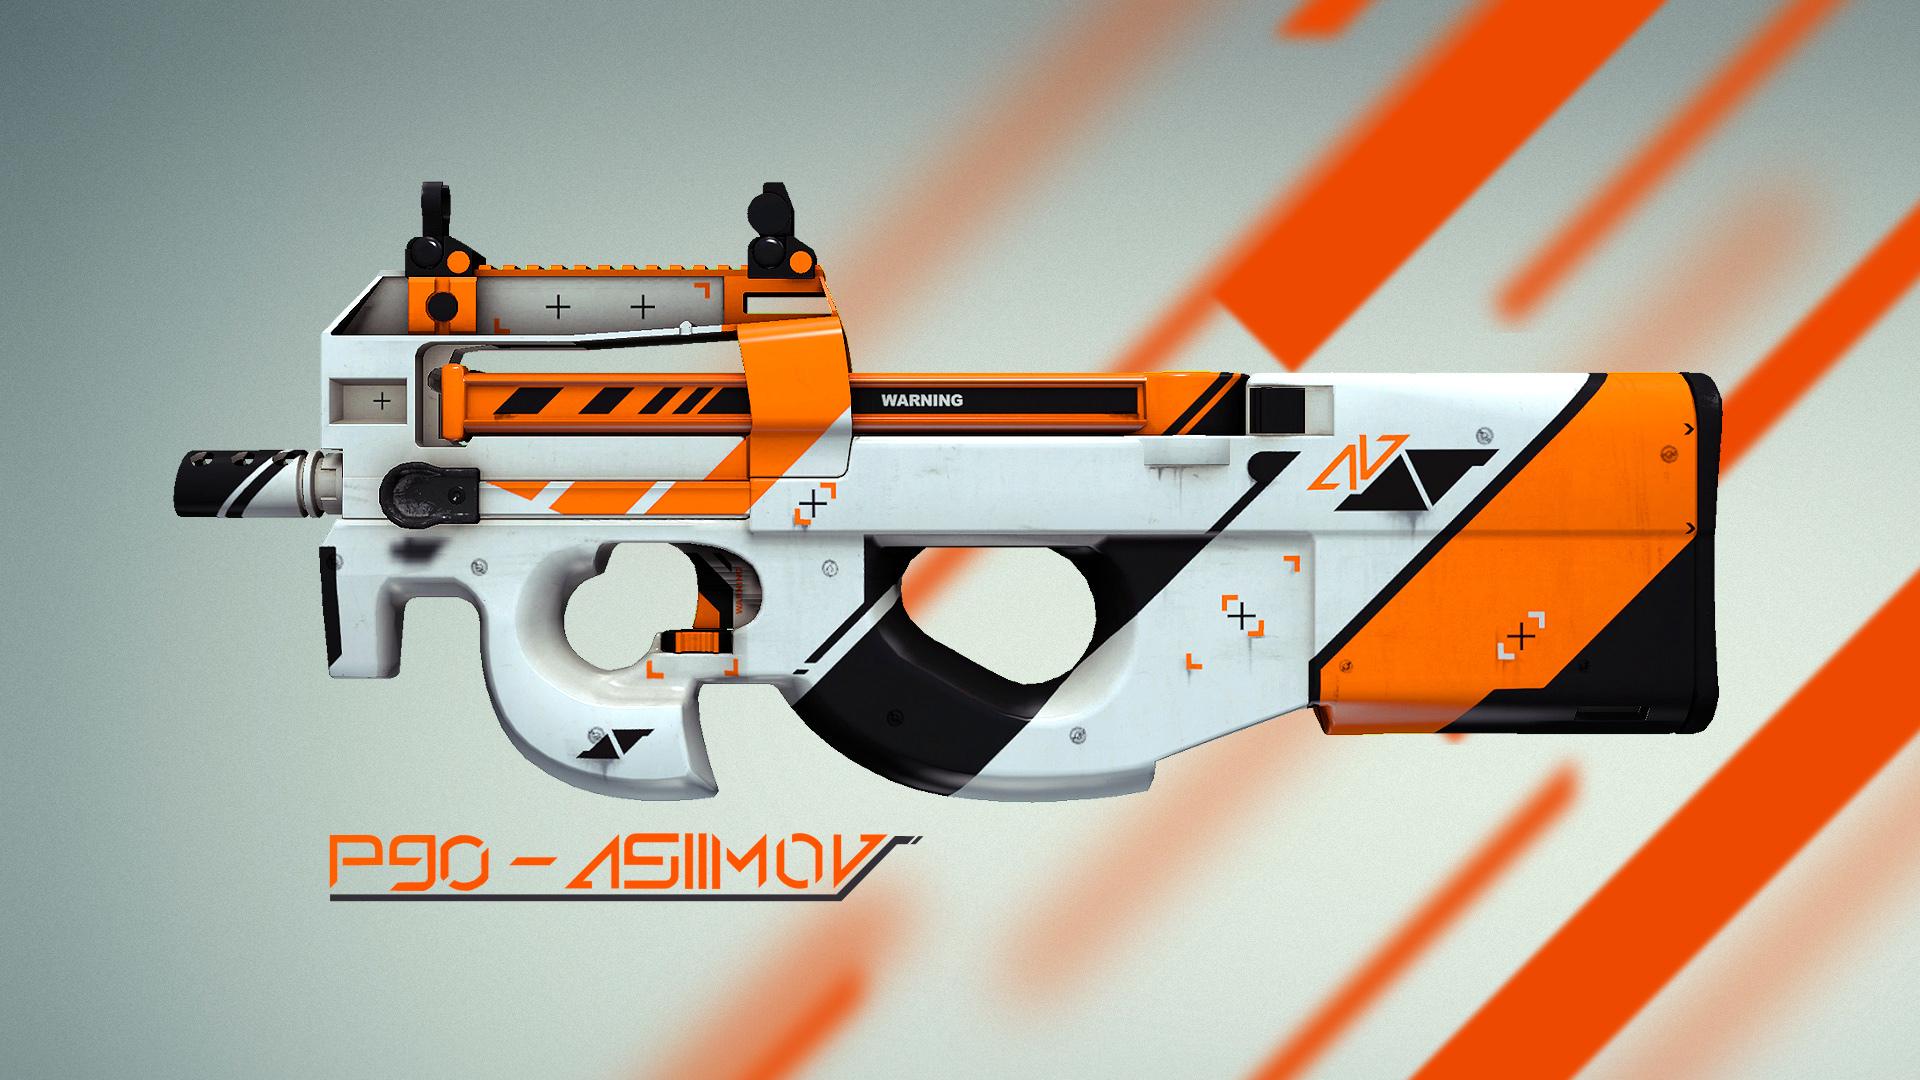 Awp Asiimov Csgo Counter Strike Global Offensive Skin Wallpapers HD 1920x1080